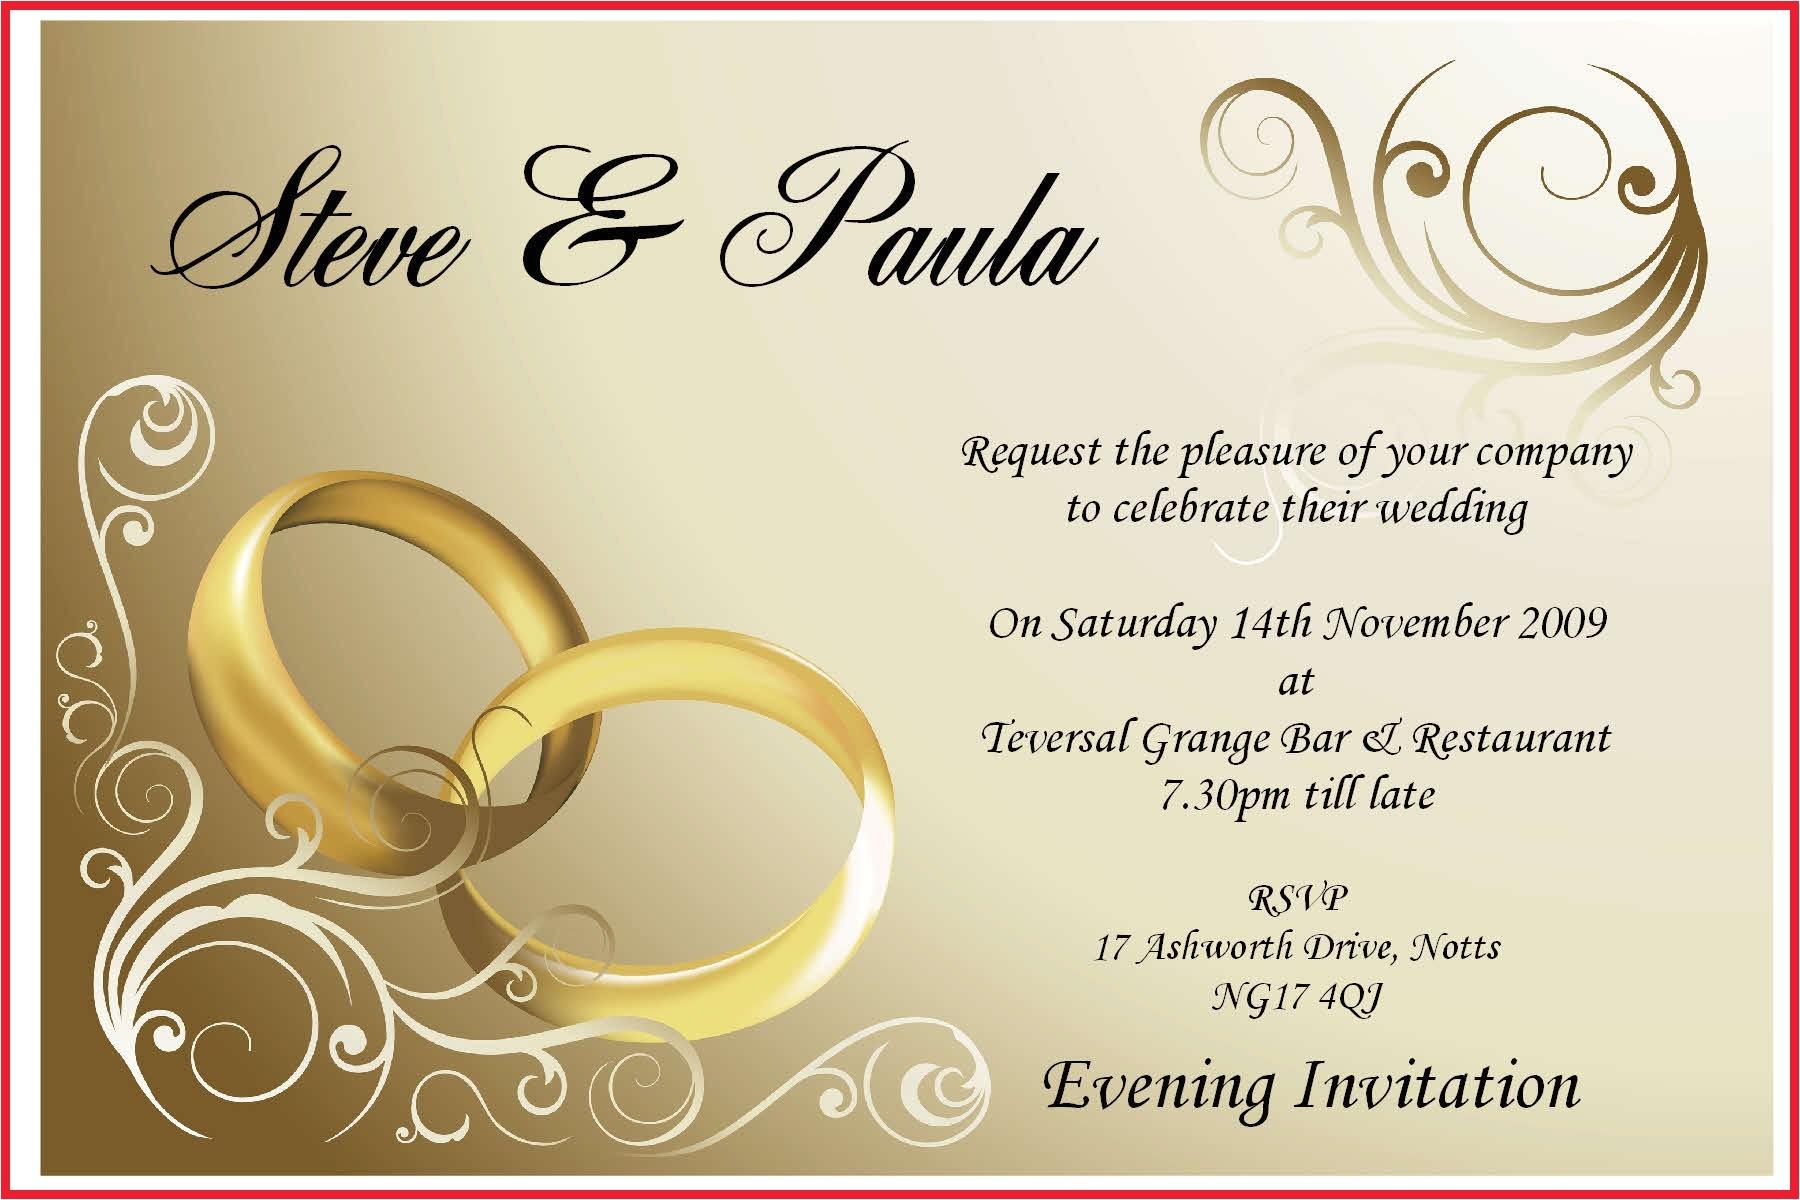 online editable wedding invitation cards free download 165127 wedding invitation card templates fieldstation